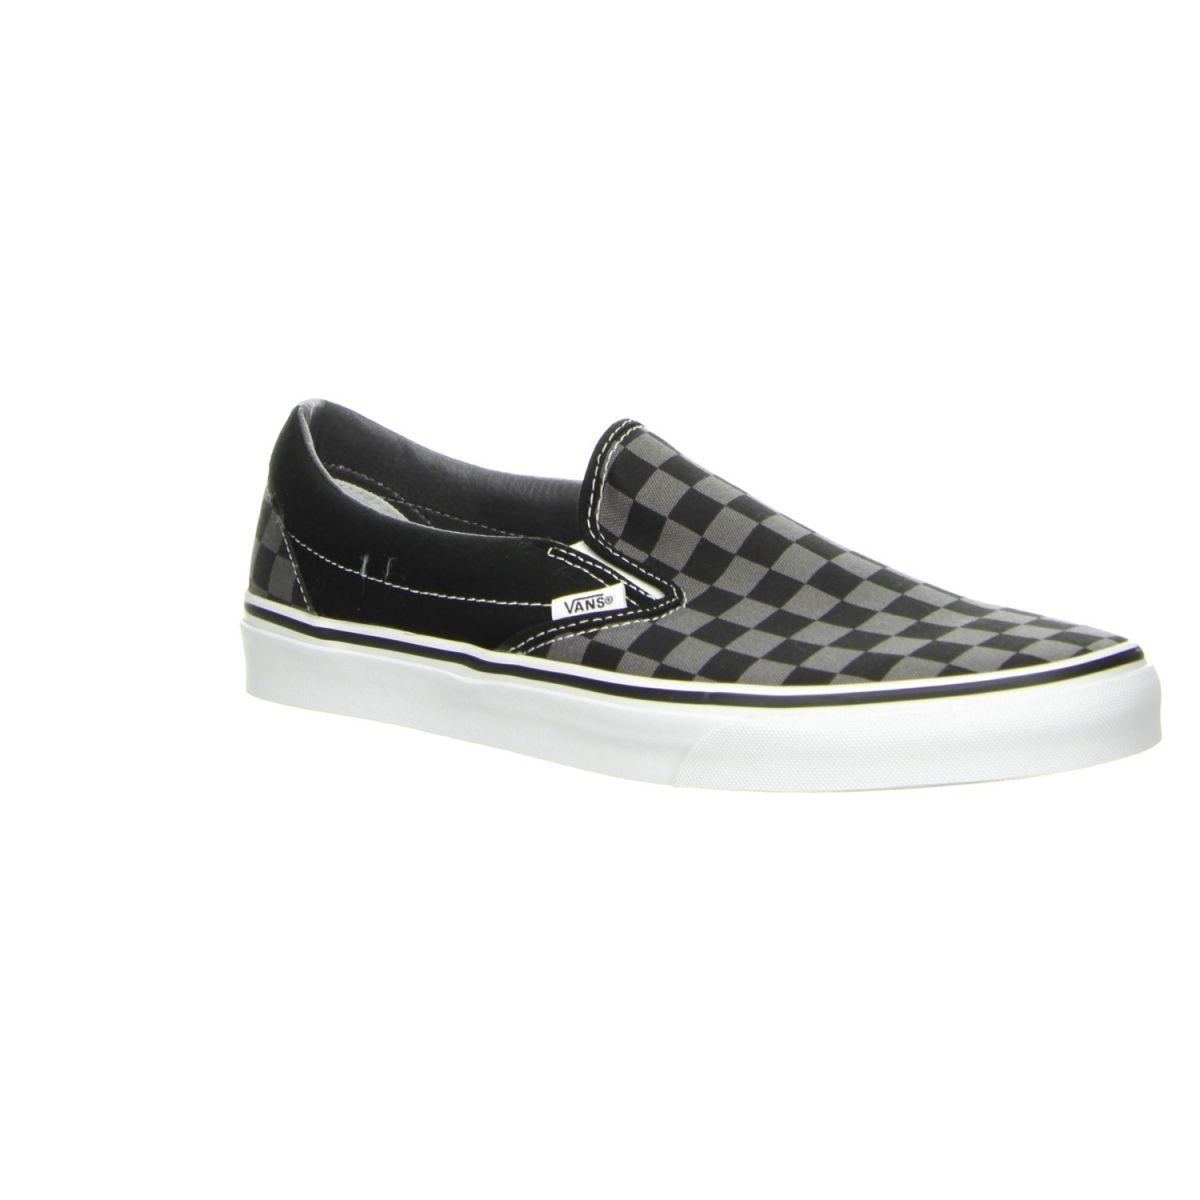 Vans Classic Slip-On Schwarz/grau kariert - Vans sind ohnehin cool ...